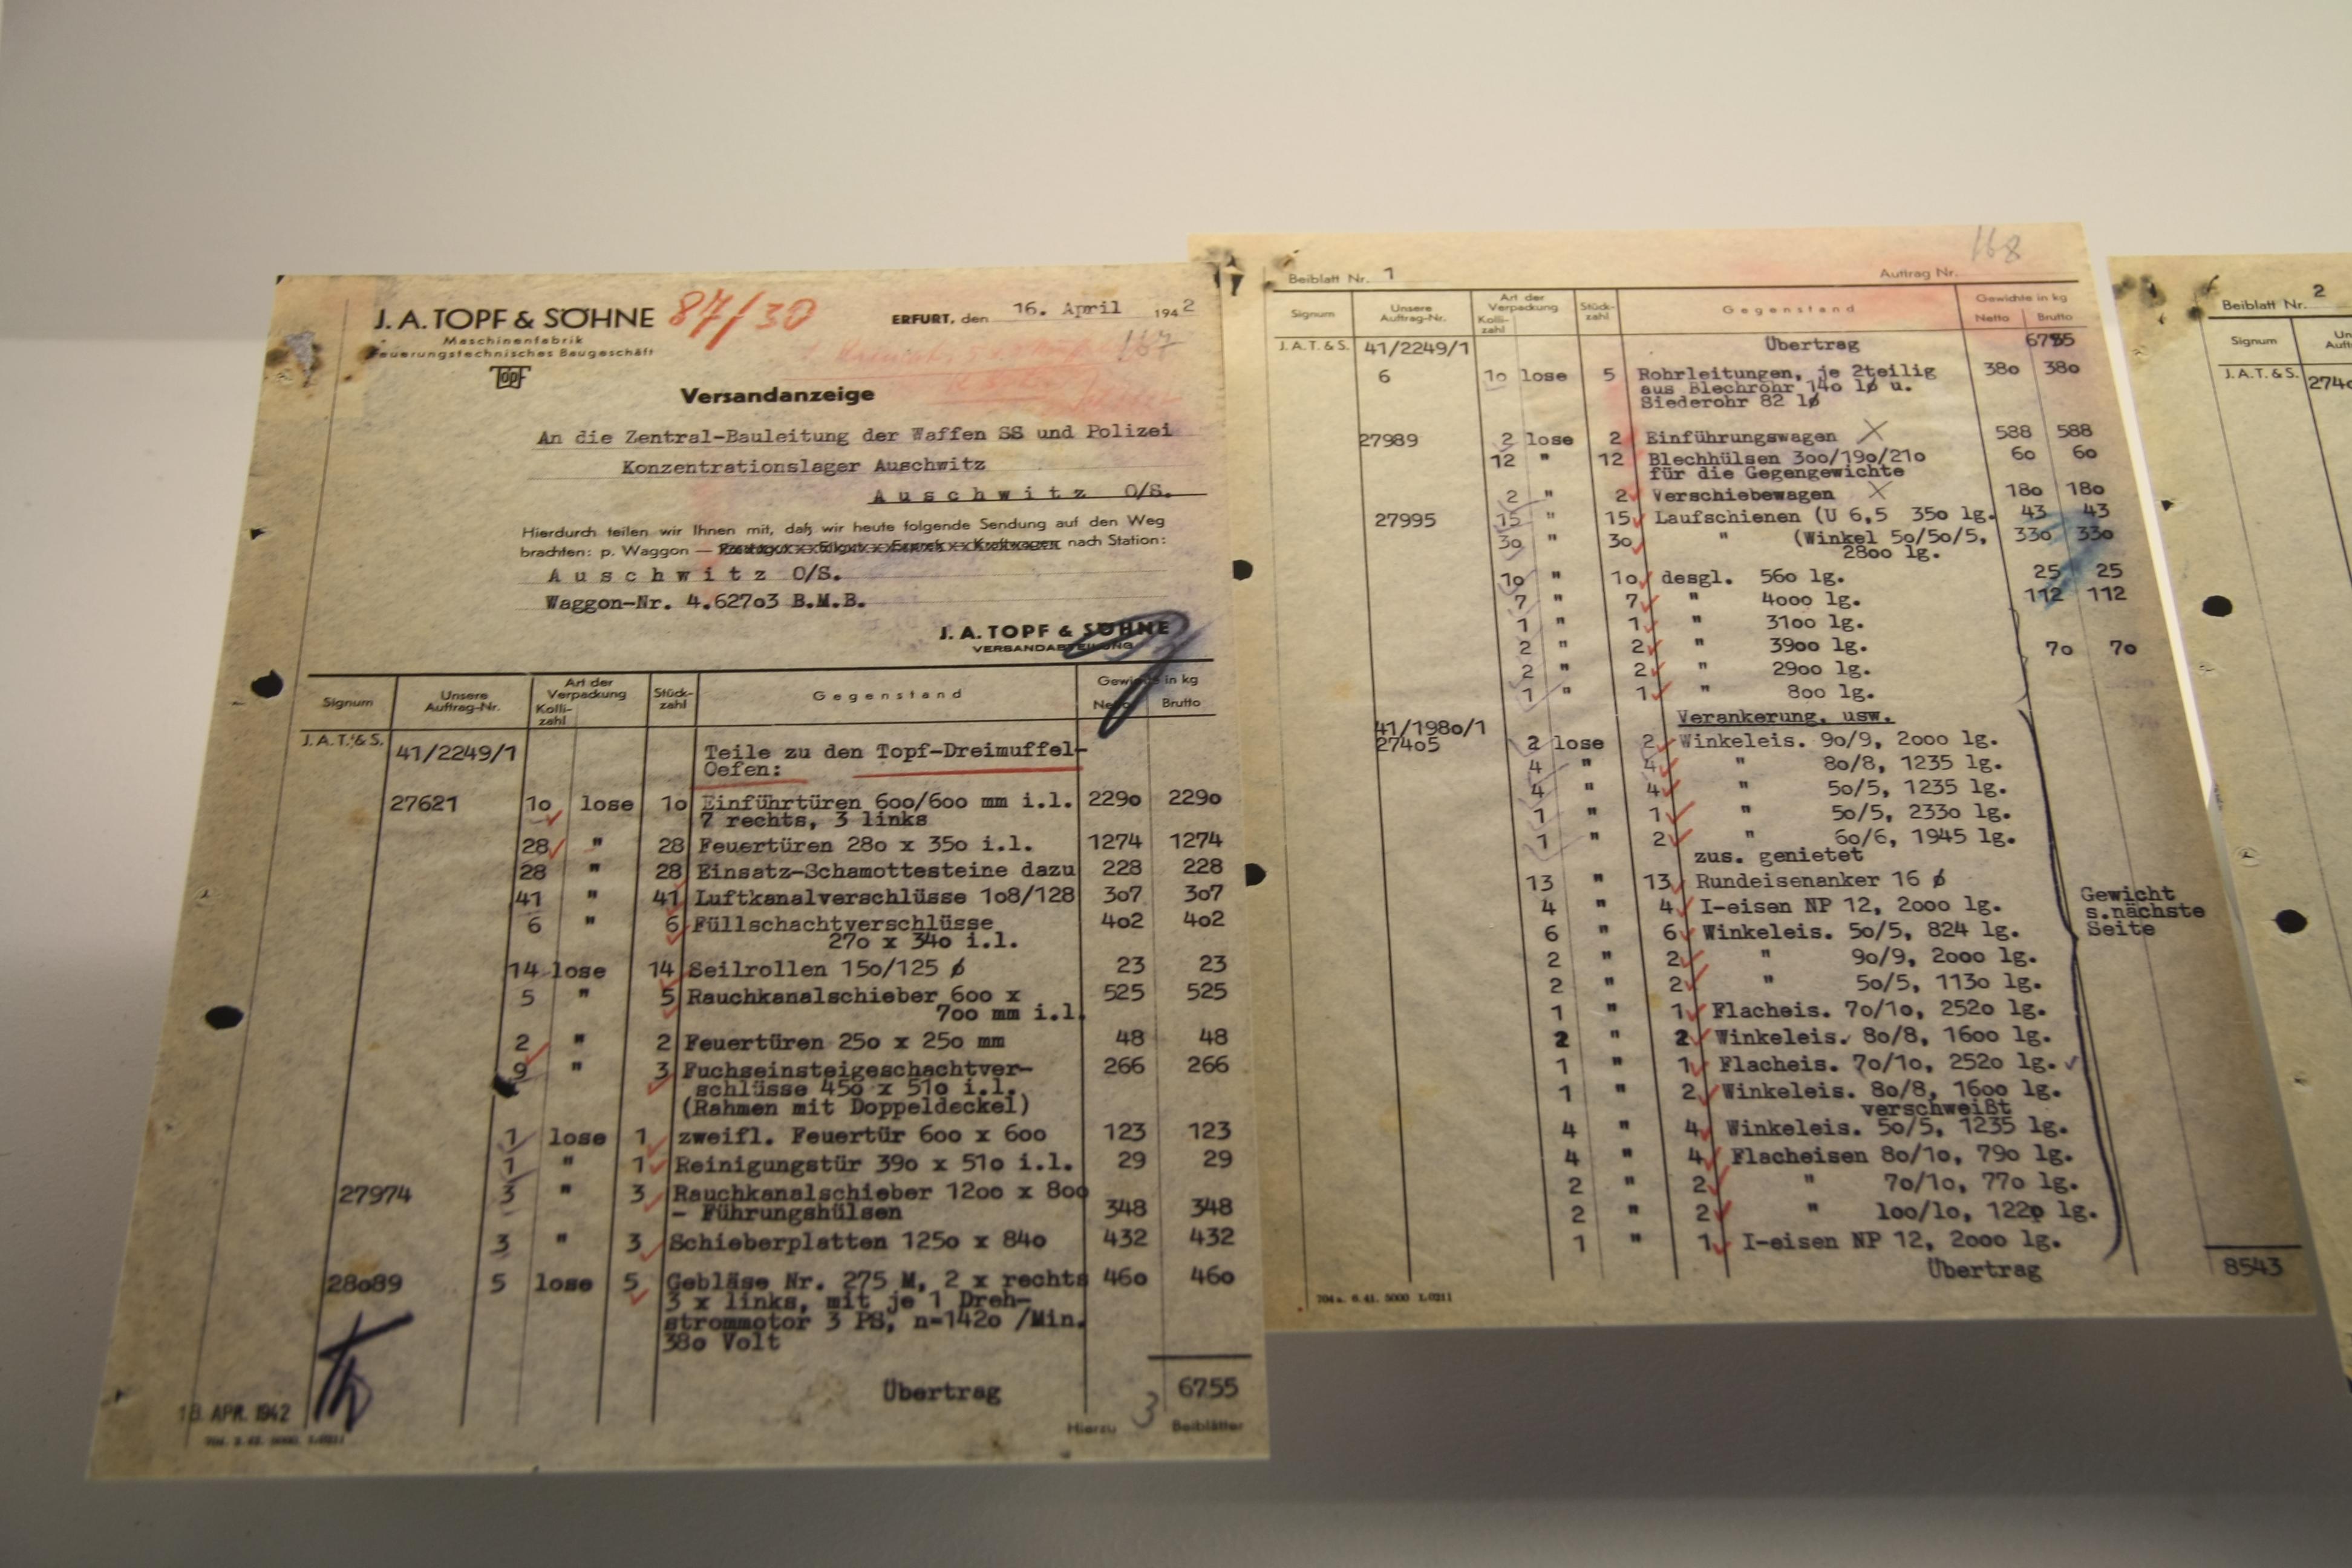 wiki File:Versandanzeige der Fa. J. A. Topf